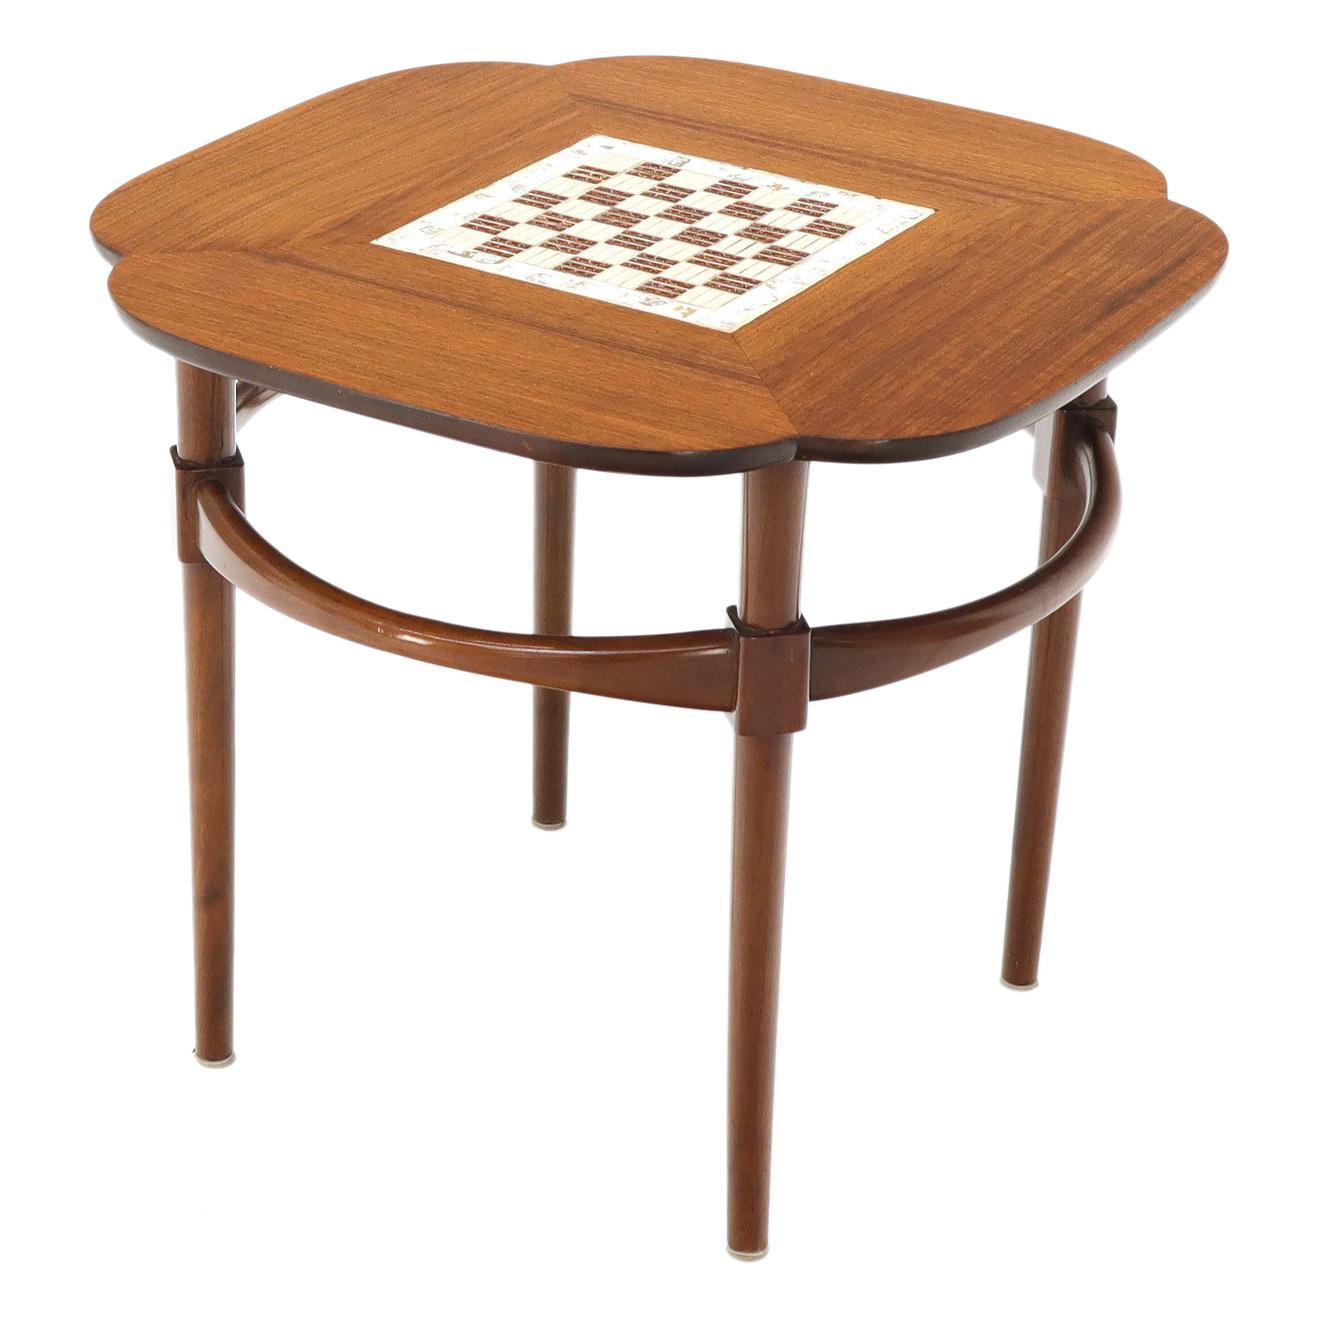 Clover Shape Checker Tile Top Walnut Side Table